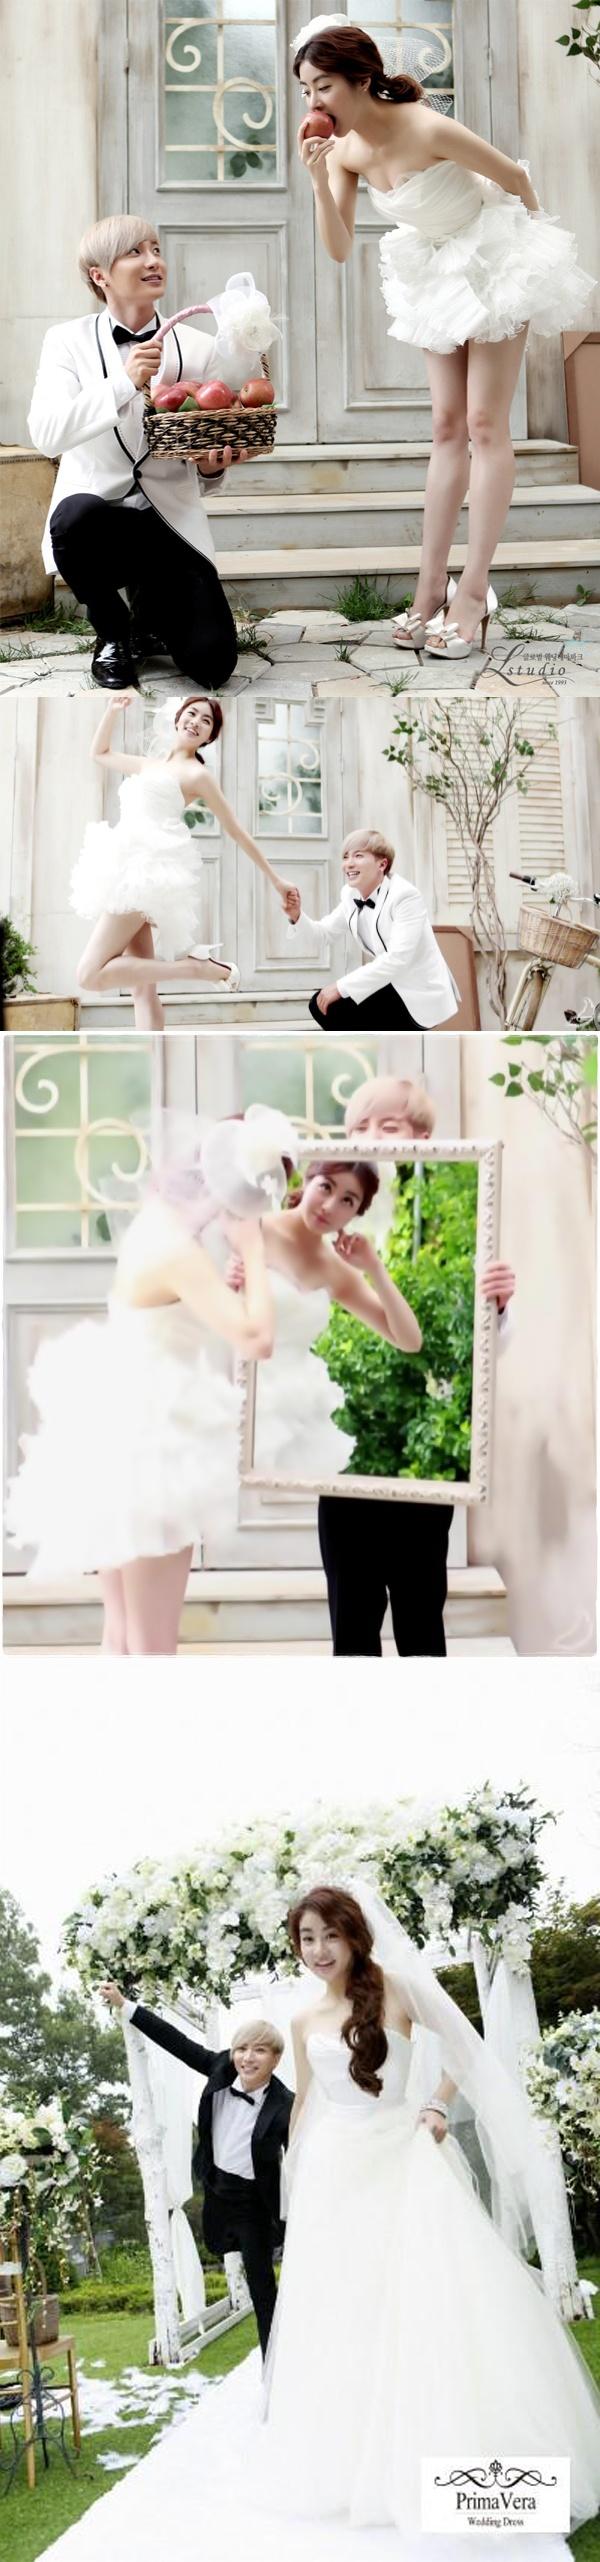 Leeteuk (Super Junior) & Kang Sora Wedding Pictures